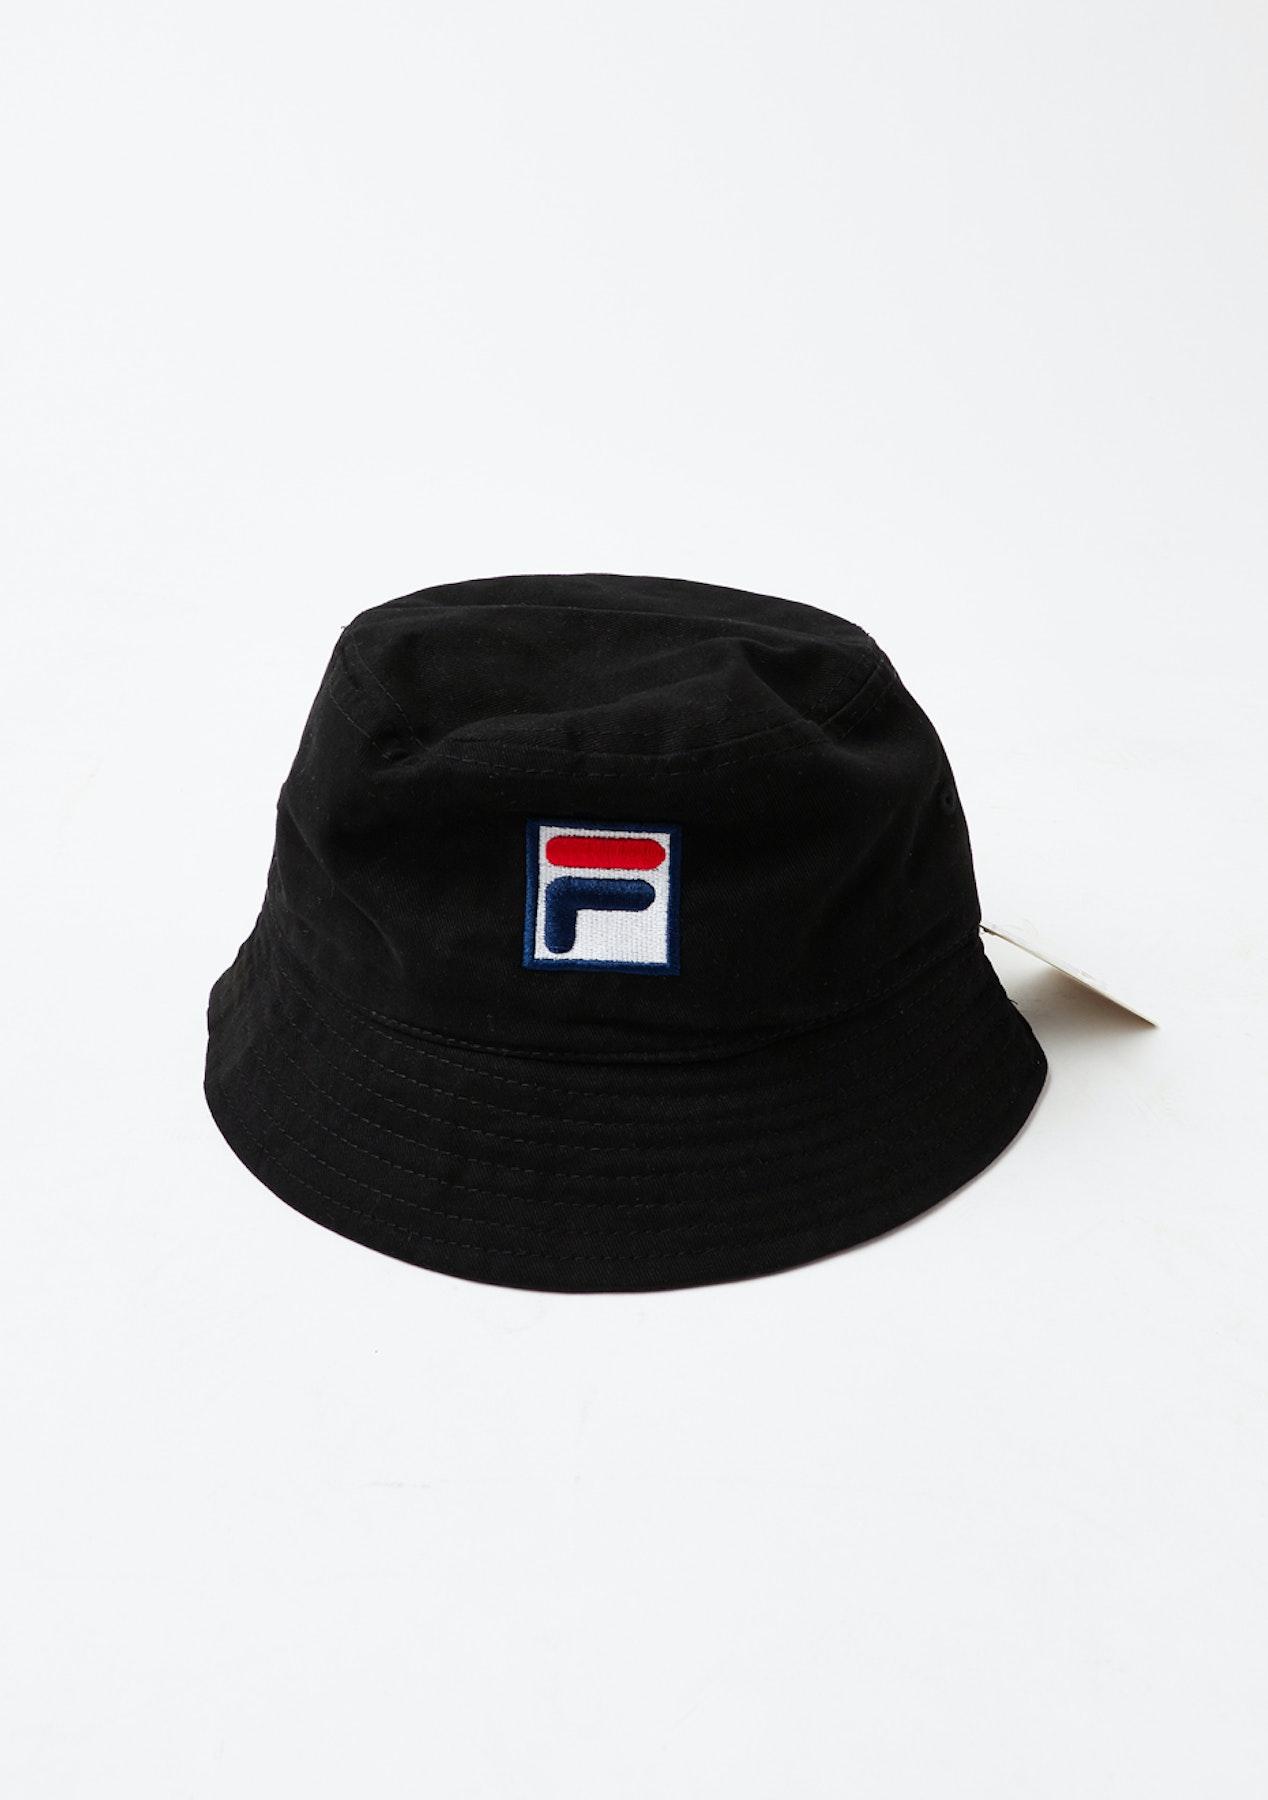 Fila Bucket Hat - Black - Express Shipping Champion + More - Onceit 89c930b49ae